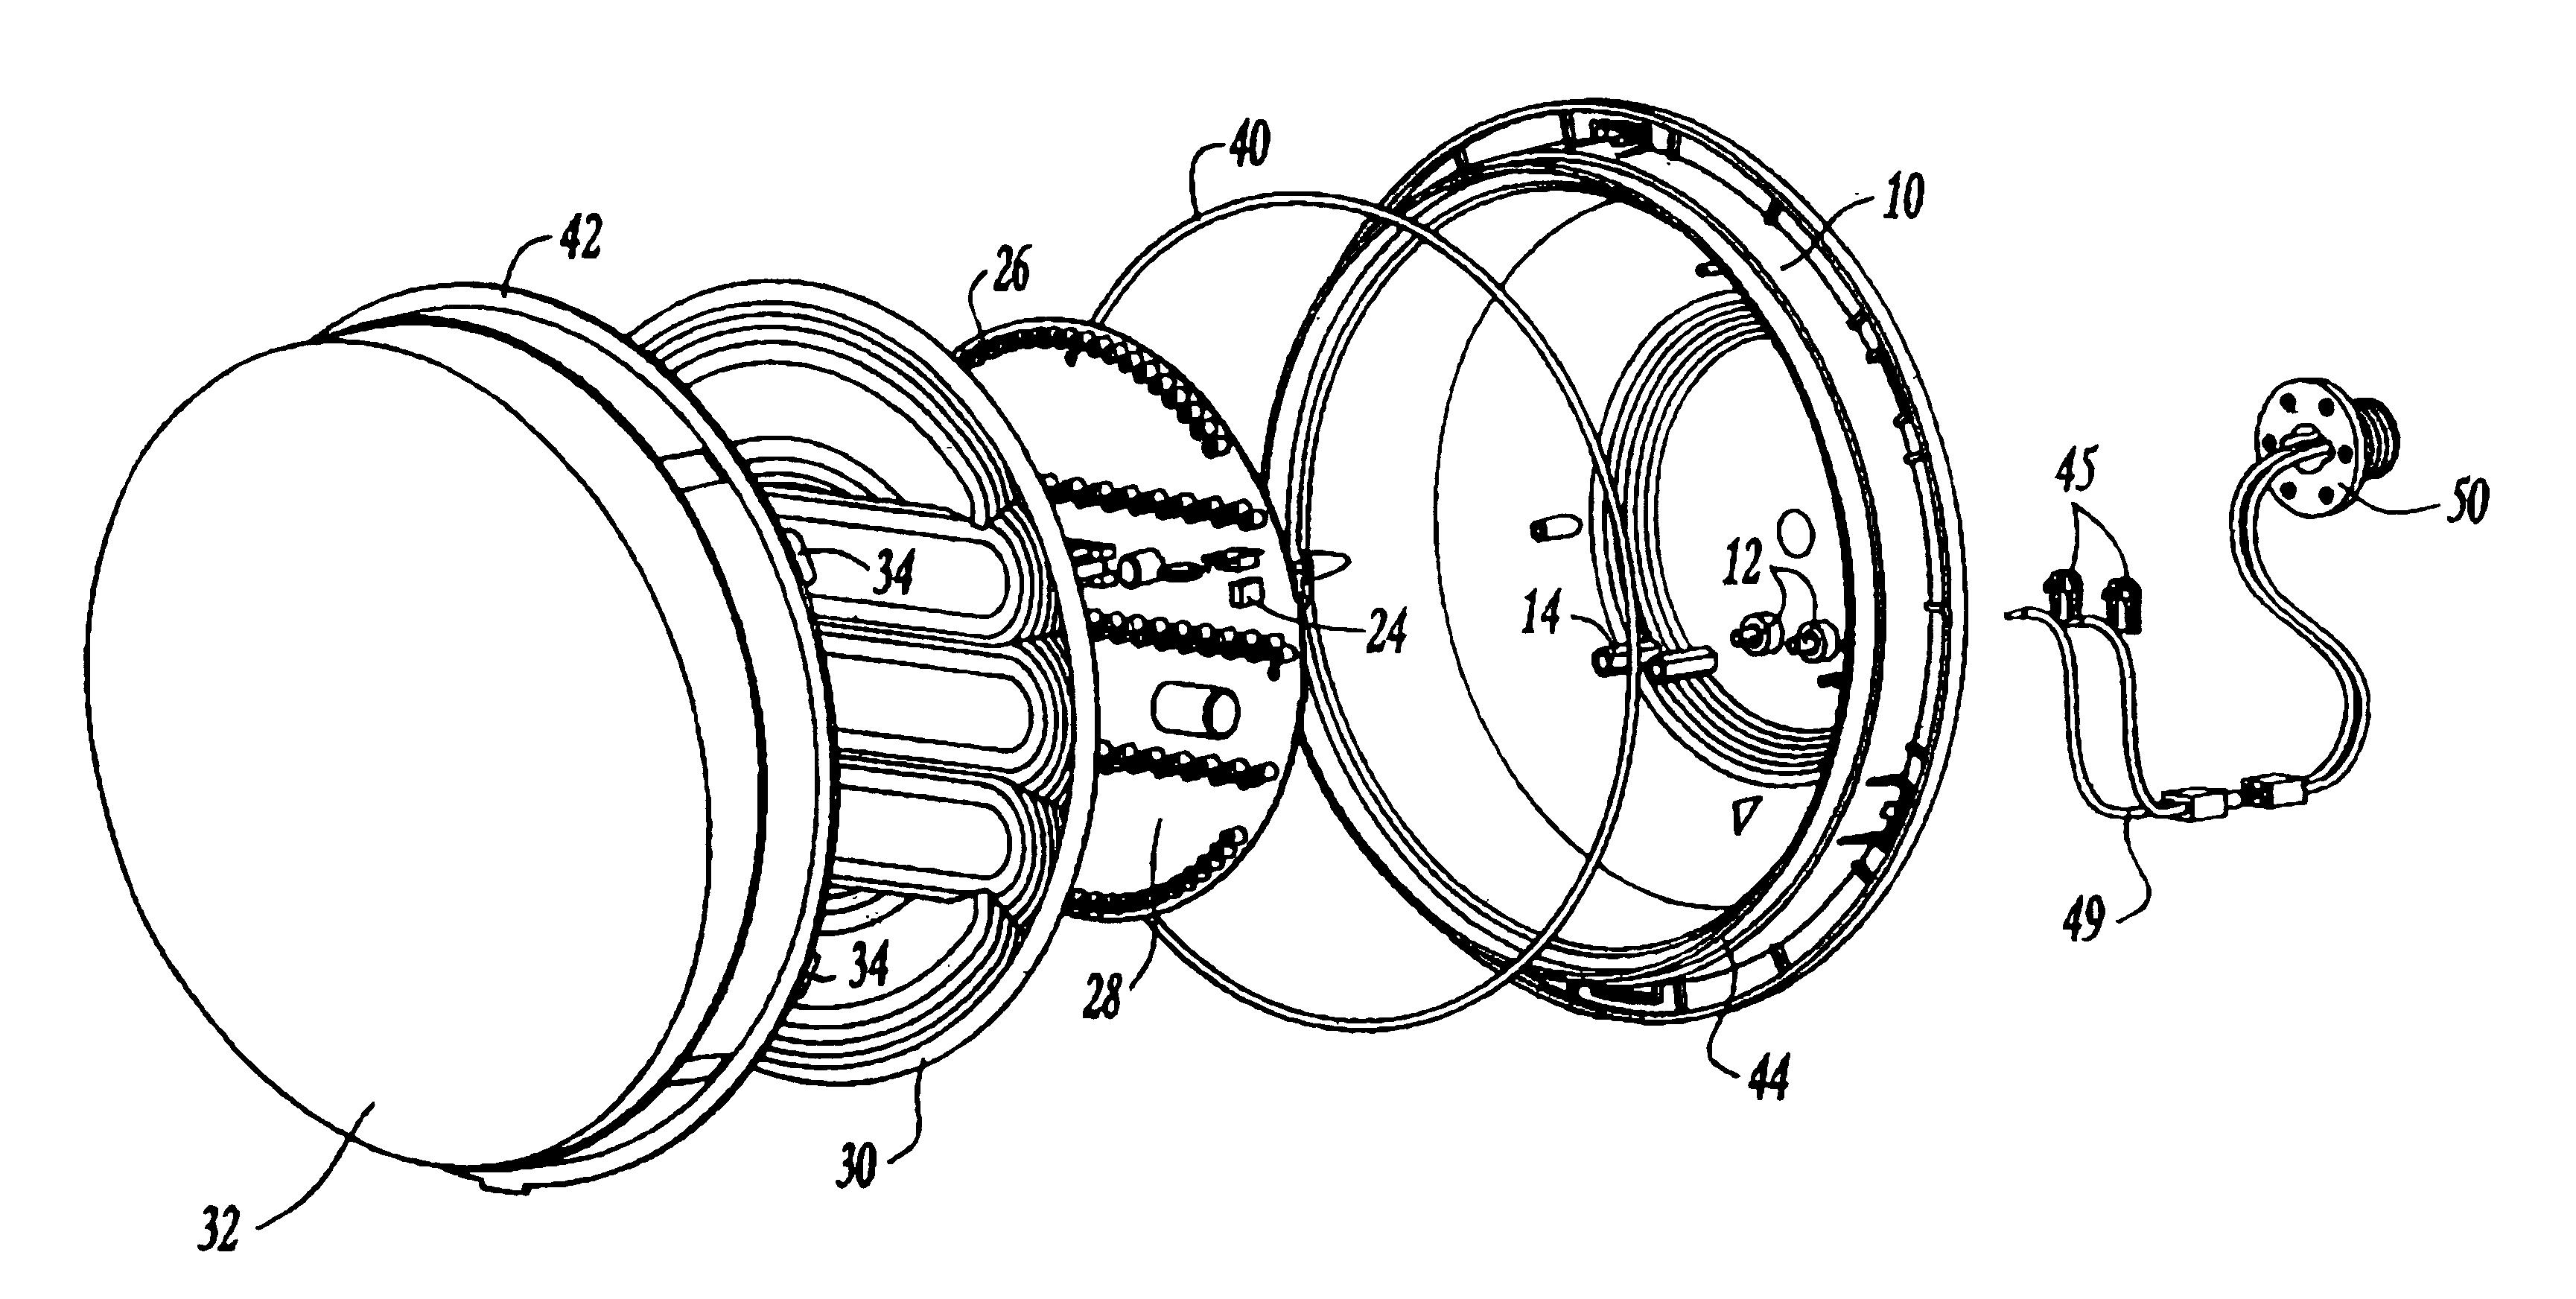 patent us6731222 - sun phantom led traffic signal